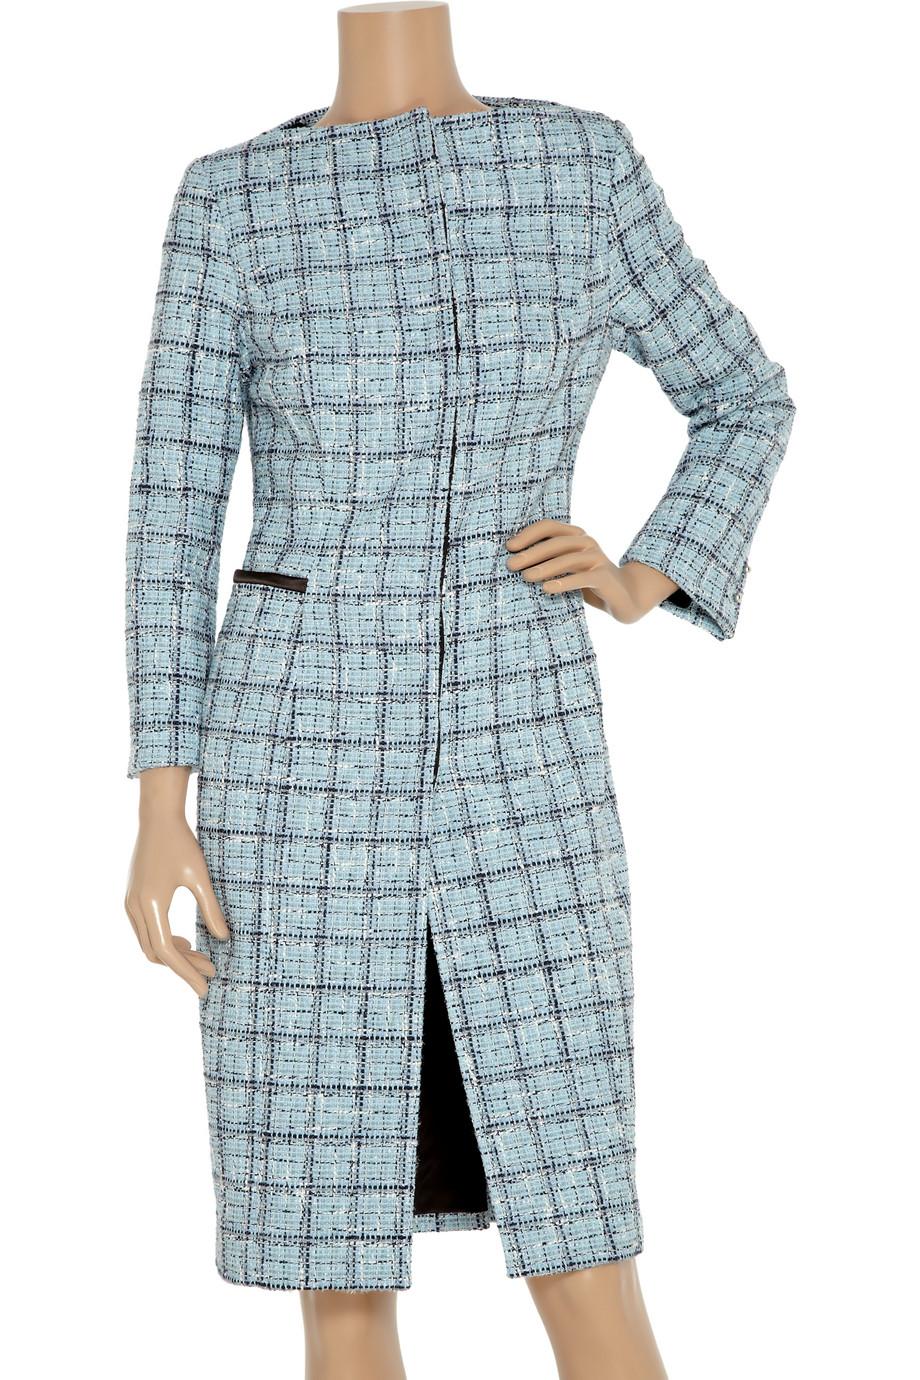 Lyst Carolina Herrera Plaid Cotton Blend Coat In Blue